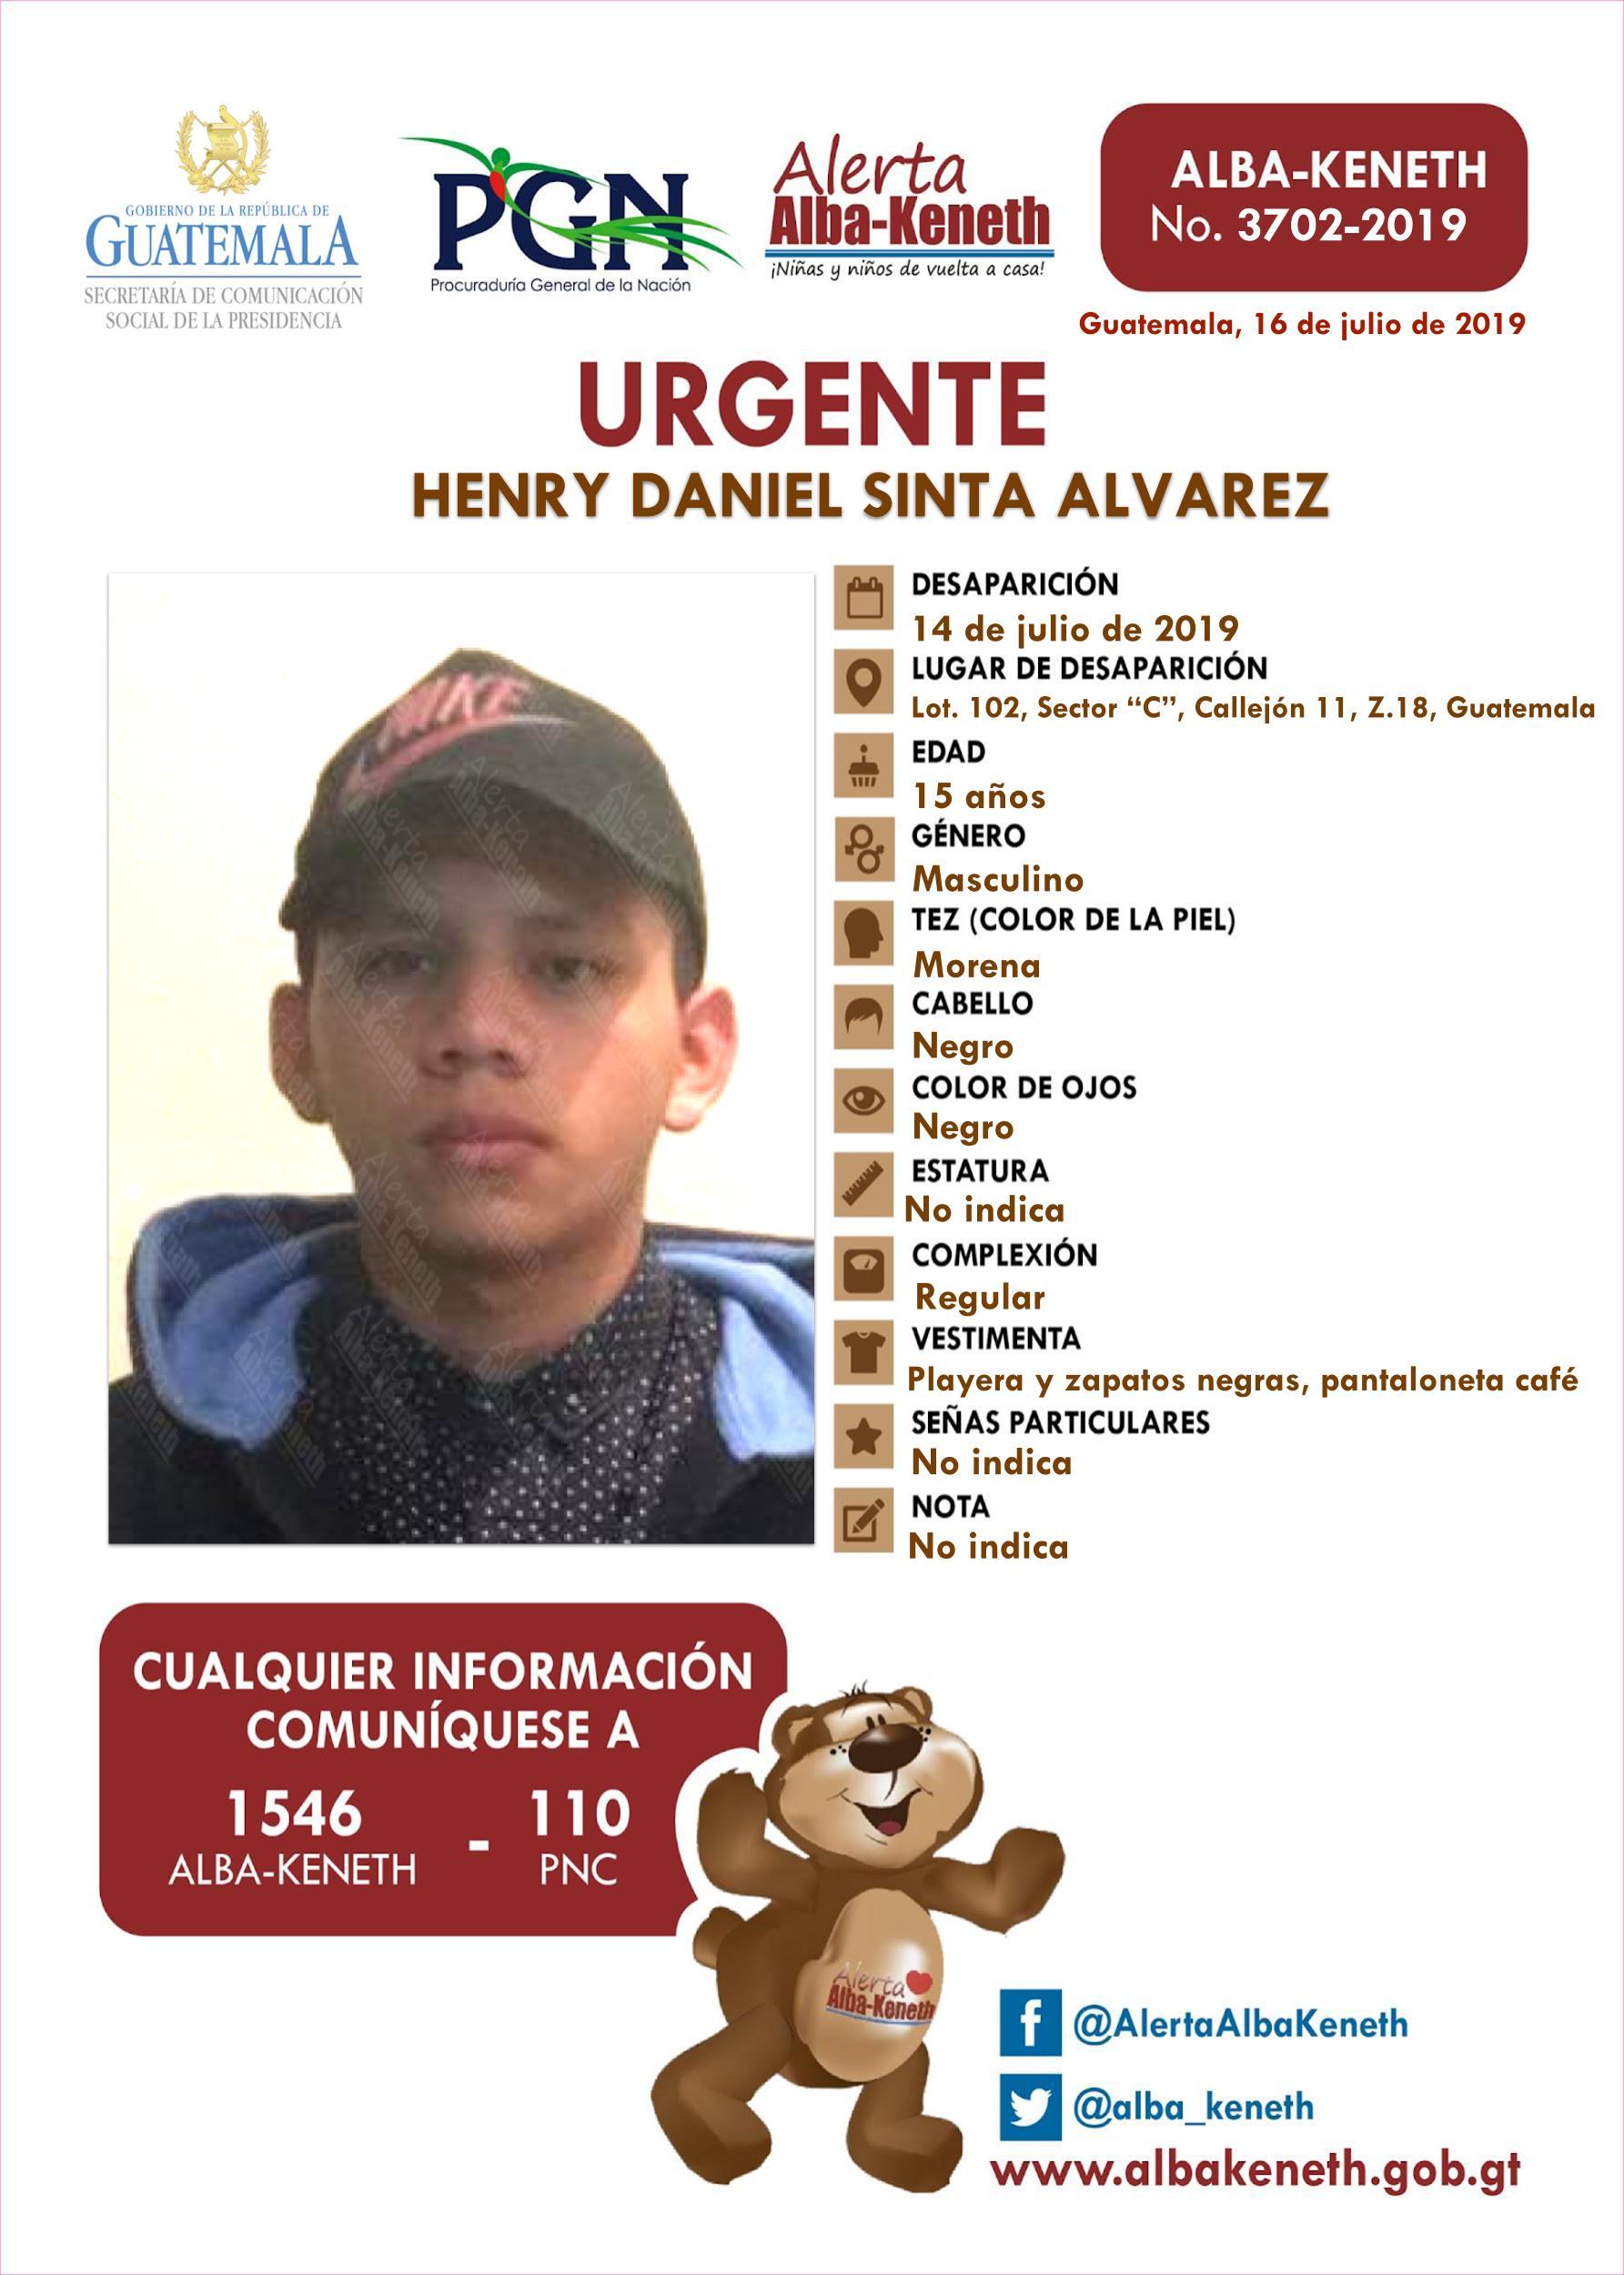 Henry Daniel Sinta Alvarez